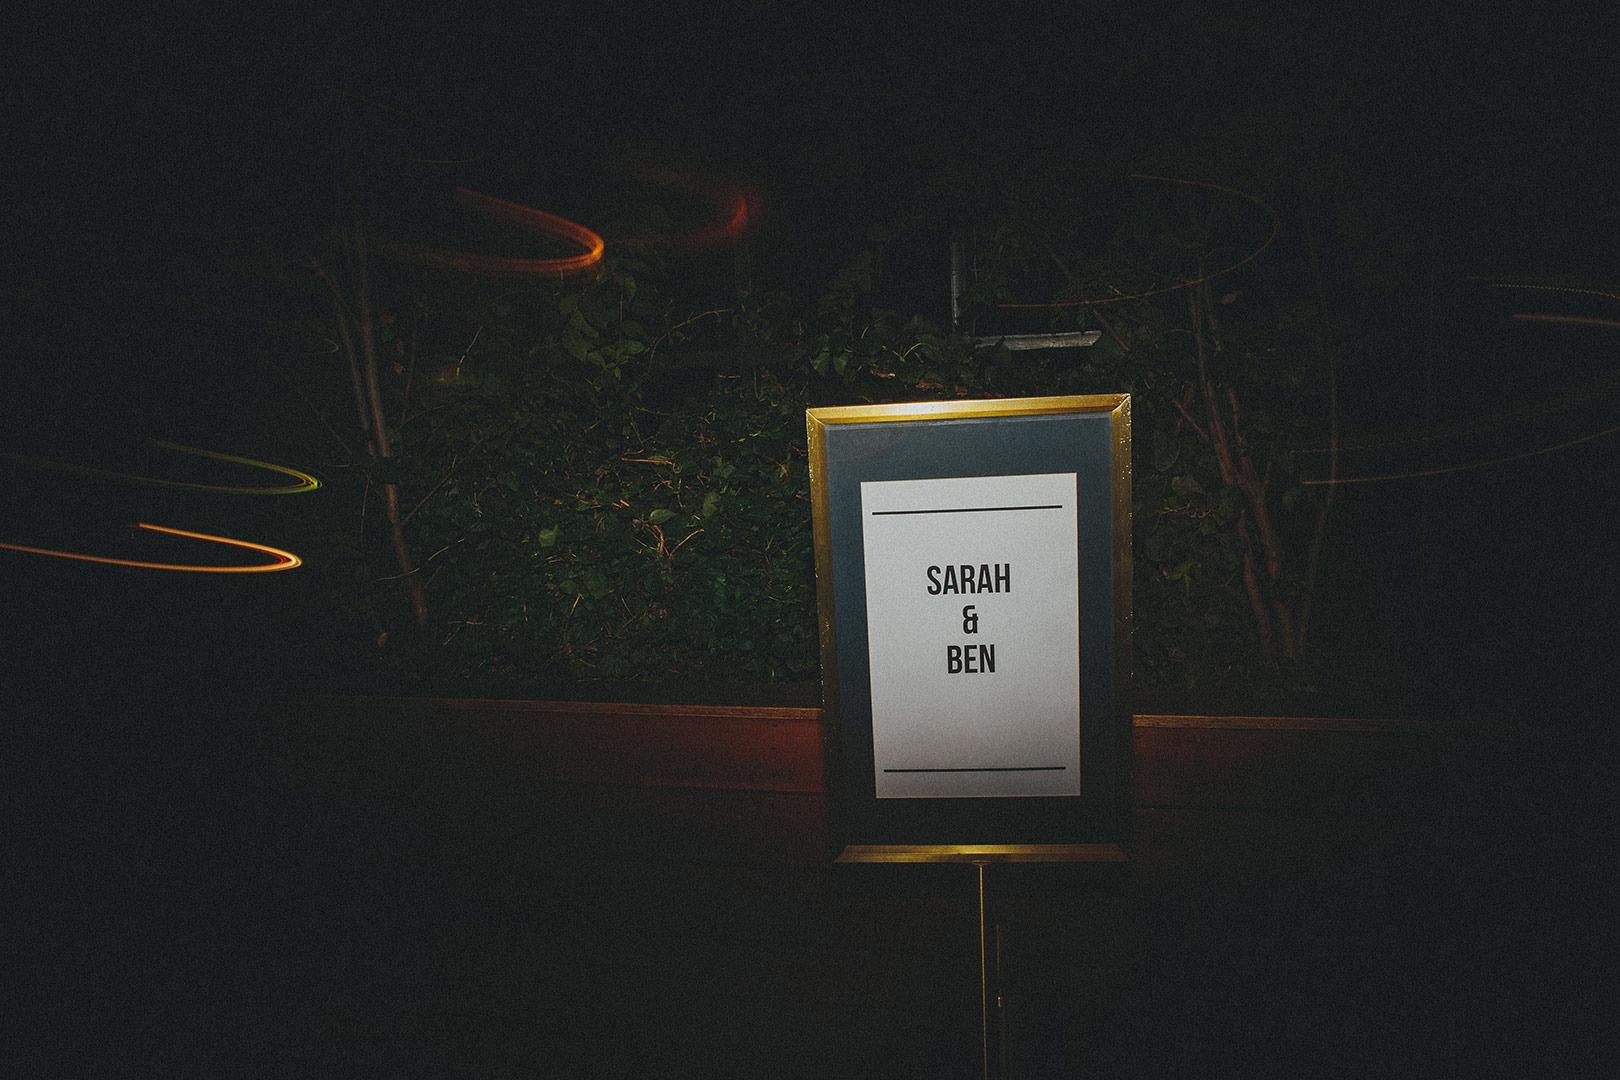 sarahben-703